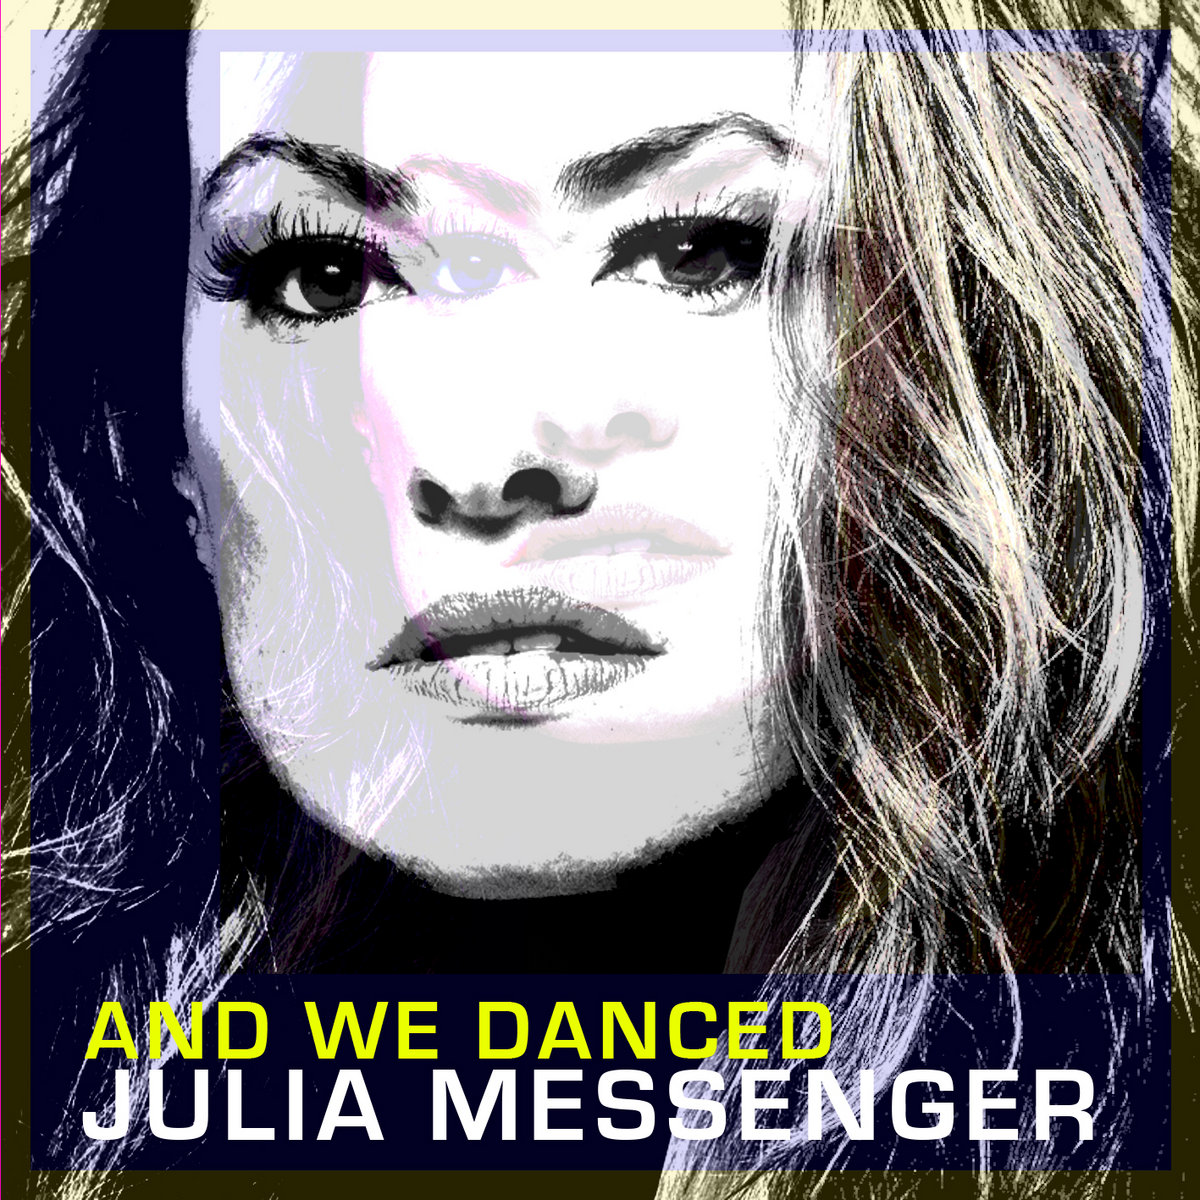 And We Danced - Radio Edit by Julia Messenger